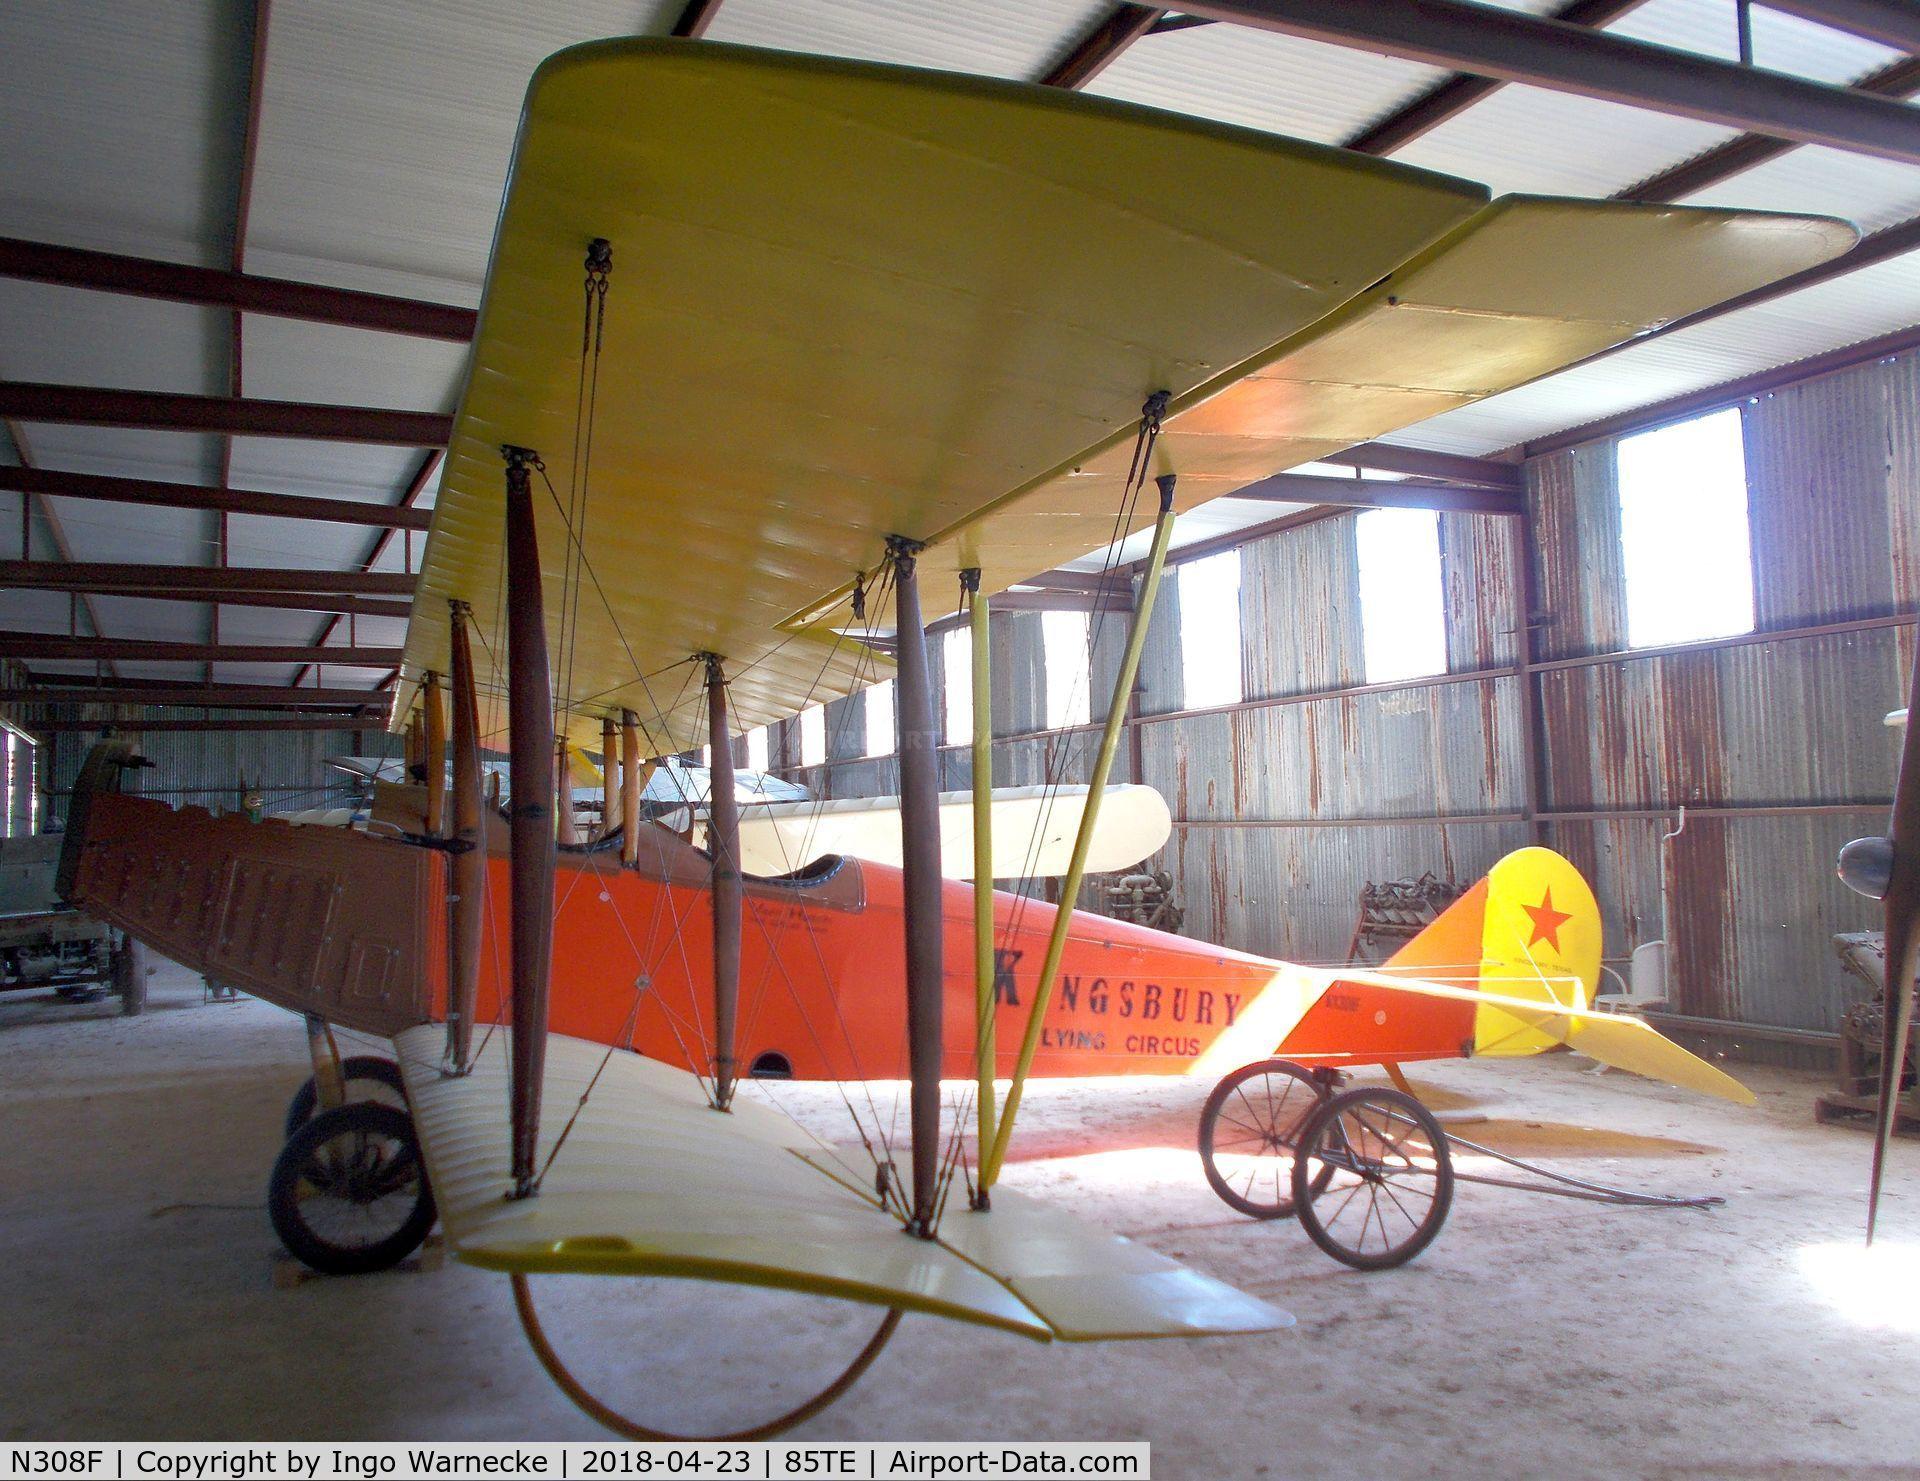 N308F, 2004 Curtiss JN-4C Jenny Replica C/N C-308, Curtiss JN-4C replica at the Pioneer Flight Museum, Kingsbury TX